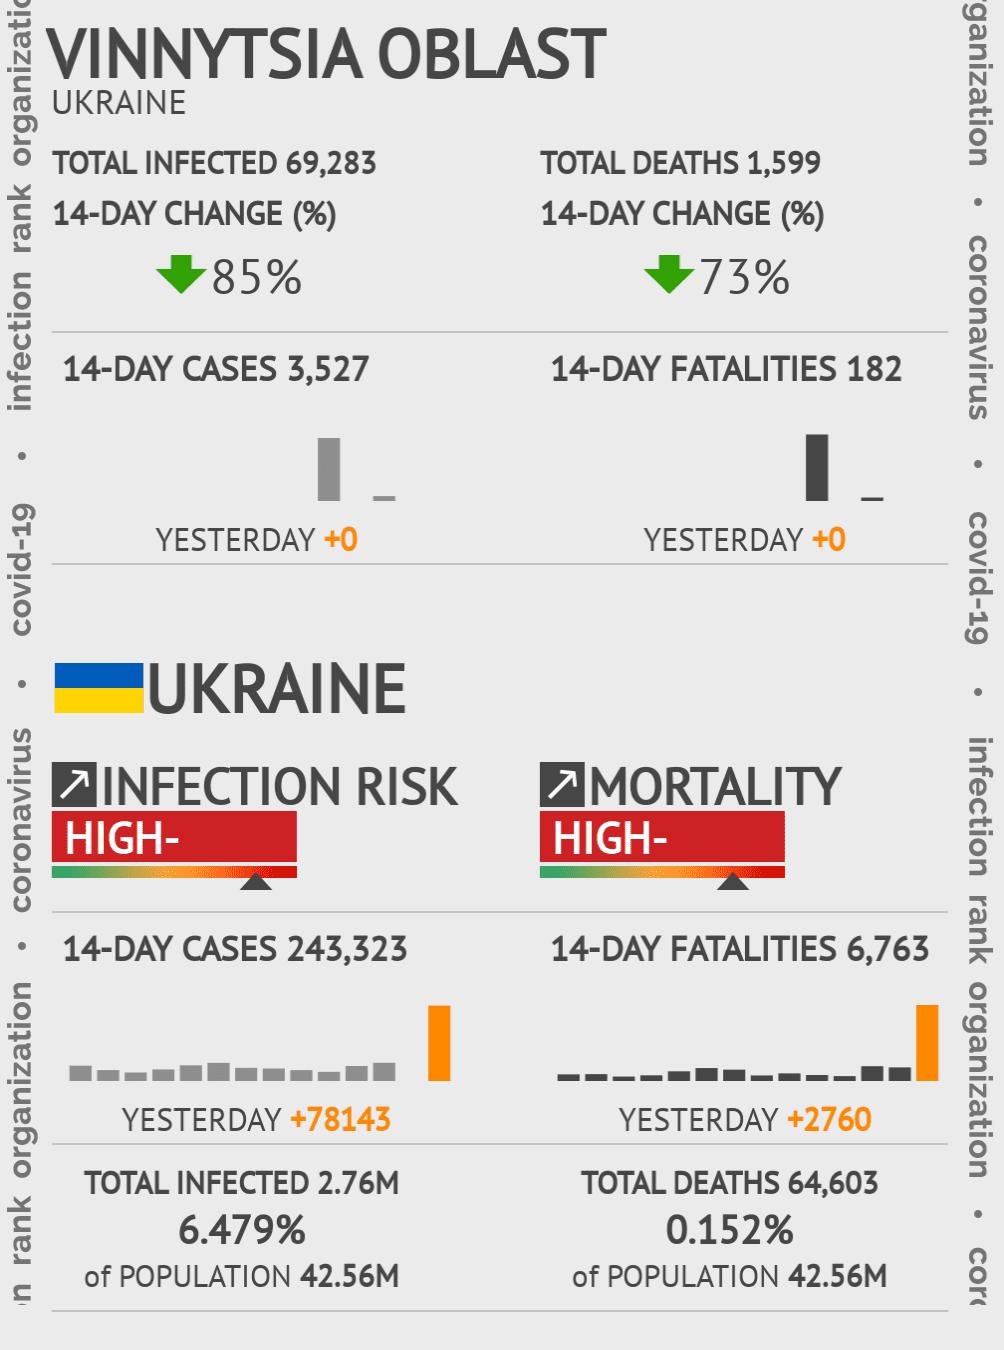 Vinnytsia Oblast Coronavirus Covid-19 Risk of Infection on March 03, 2021